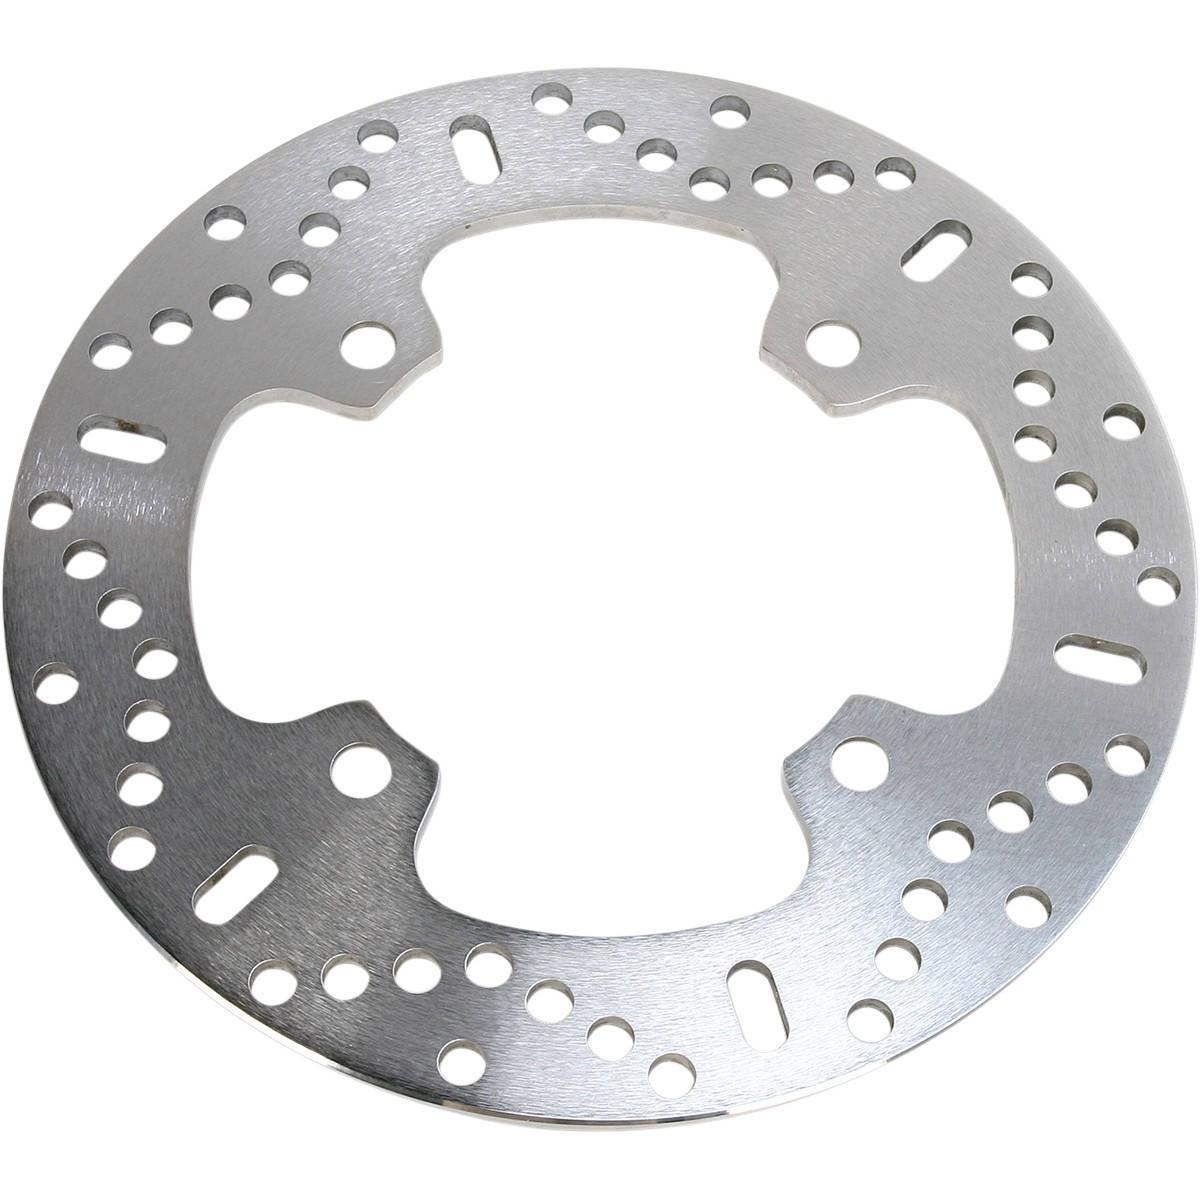 EBC OE Replacement Brake Rotor - MD627